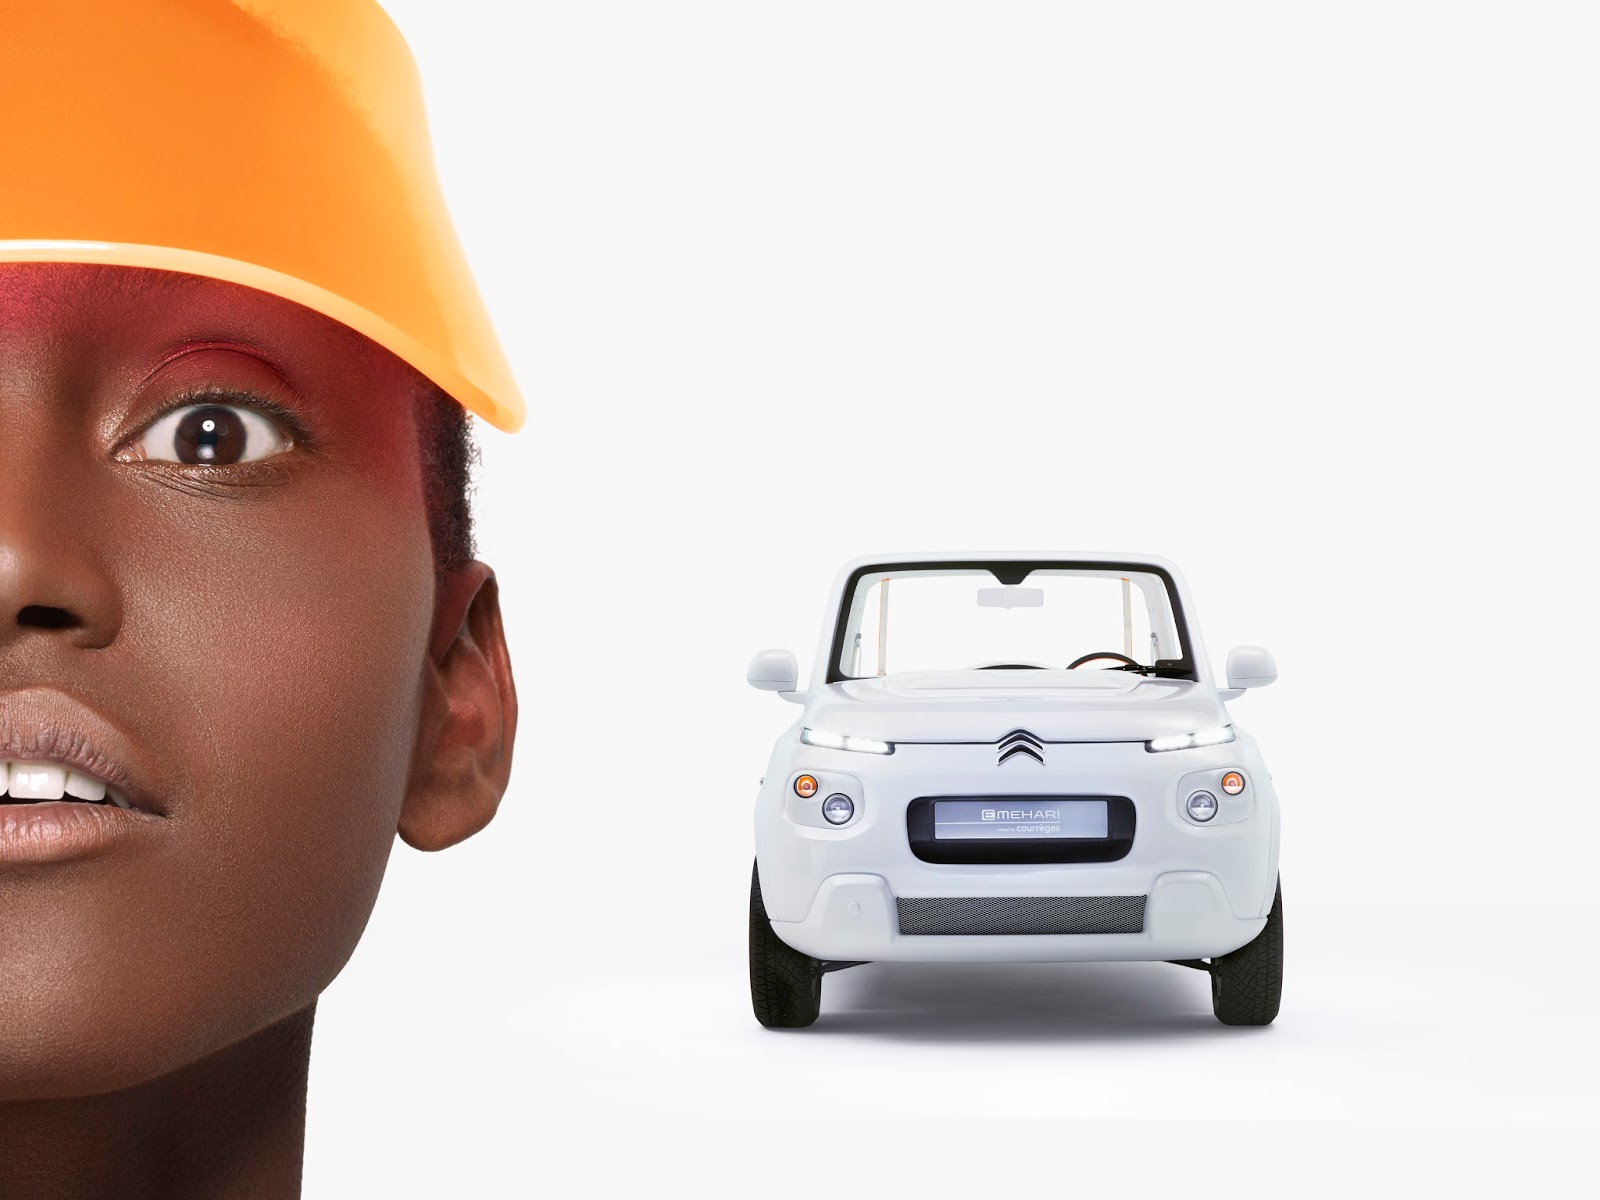 CL 16.021.015 Με 5 Παγκόσμιες Πρεμιέρες η Citroën Στο Σαλόνι Αυτοκινήτου της Γενεύης